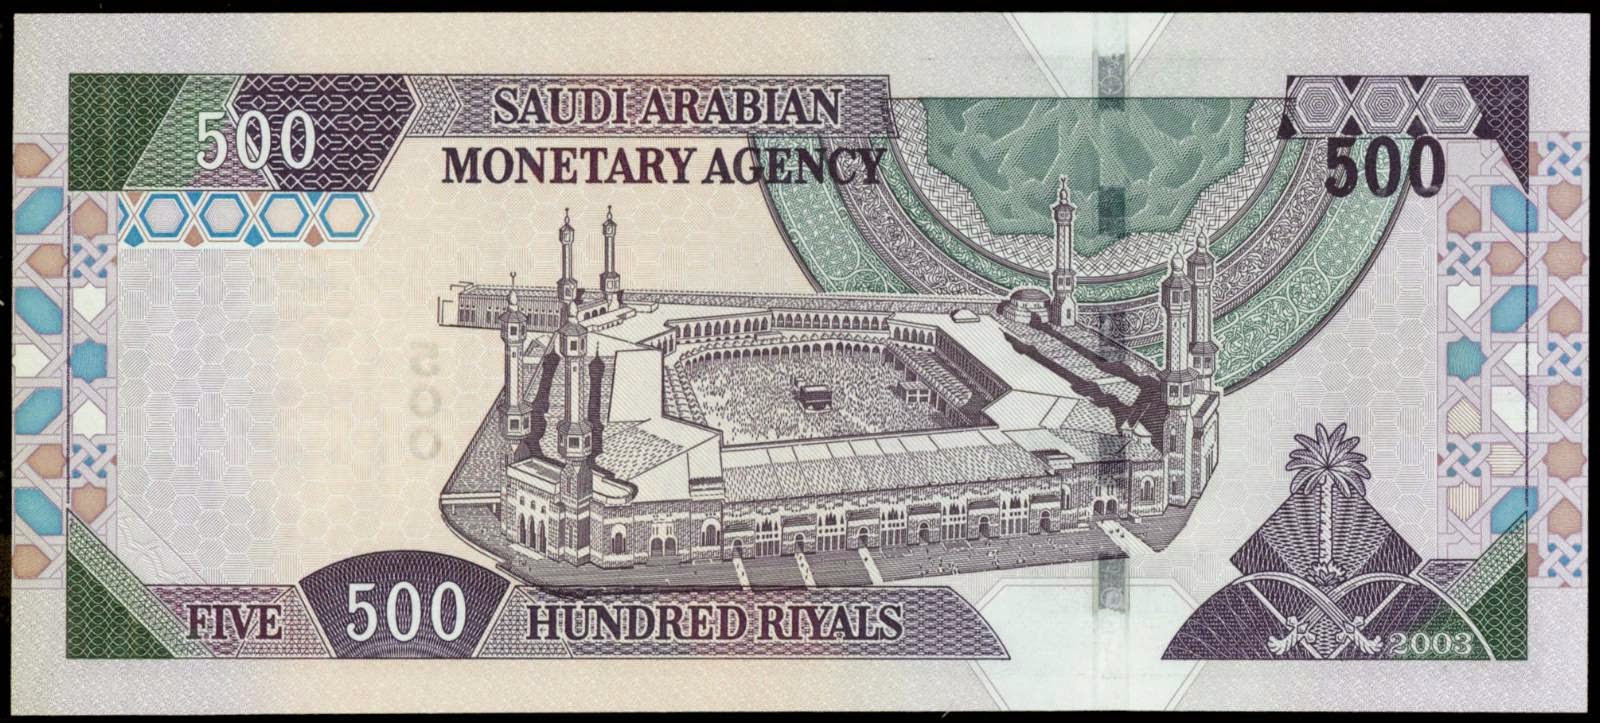 Saudi Arabia money currency 500 Saudi Riyals banknote 2003 Holy Mosque at Mecca